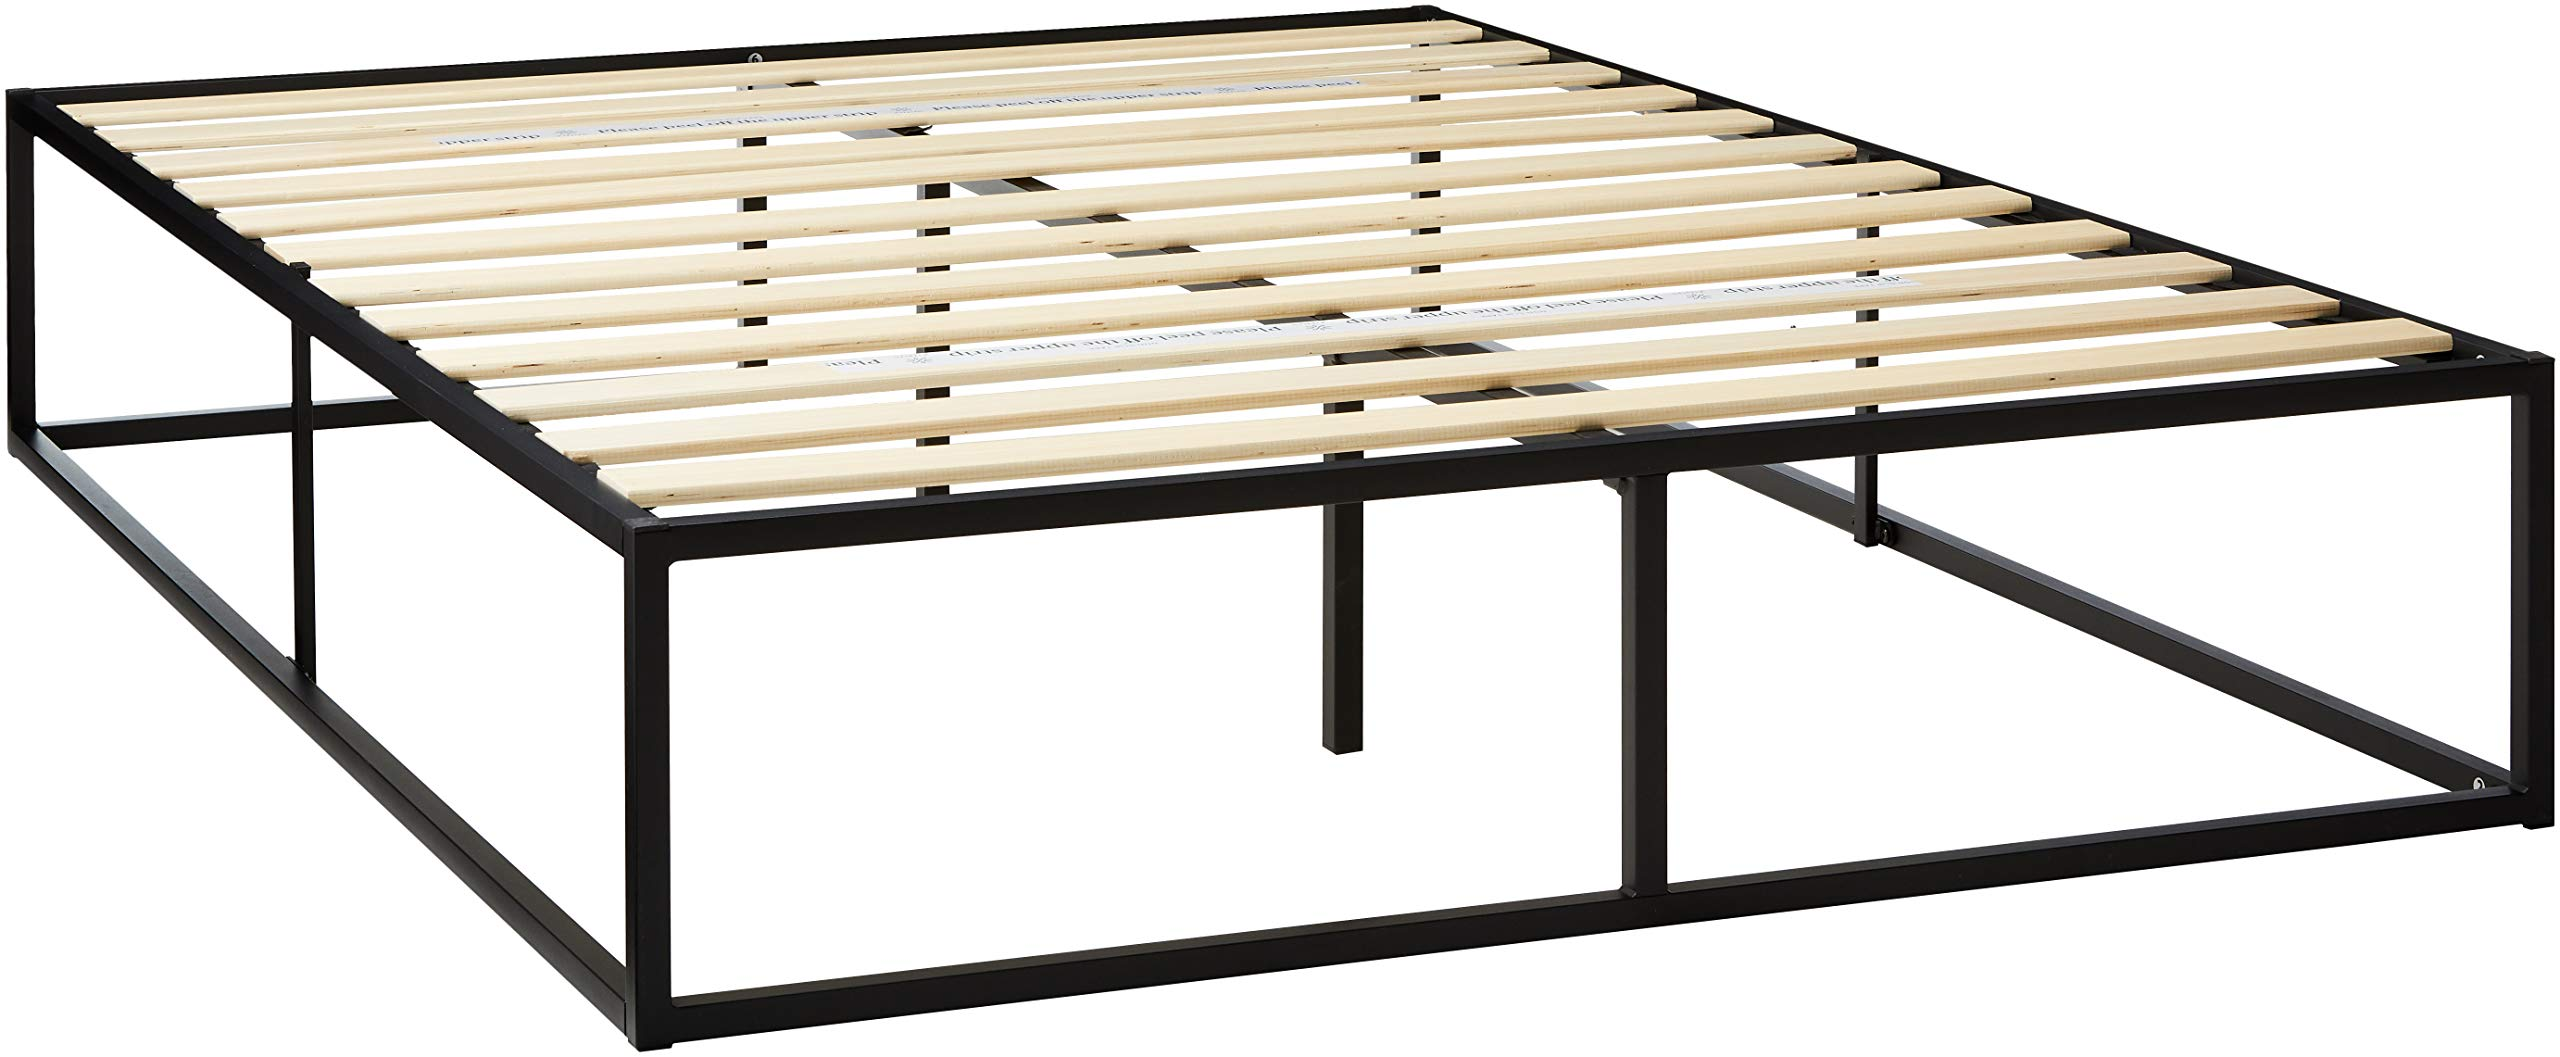 Zinus Joesph Modern Studio 14 Inch Platforma Bed Frame / Mattress Foundation with Wood Slat Support, Queen